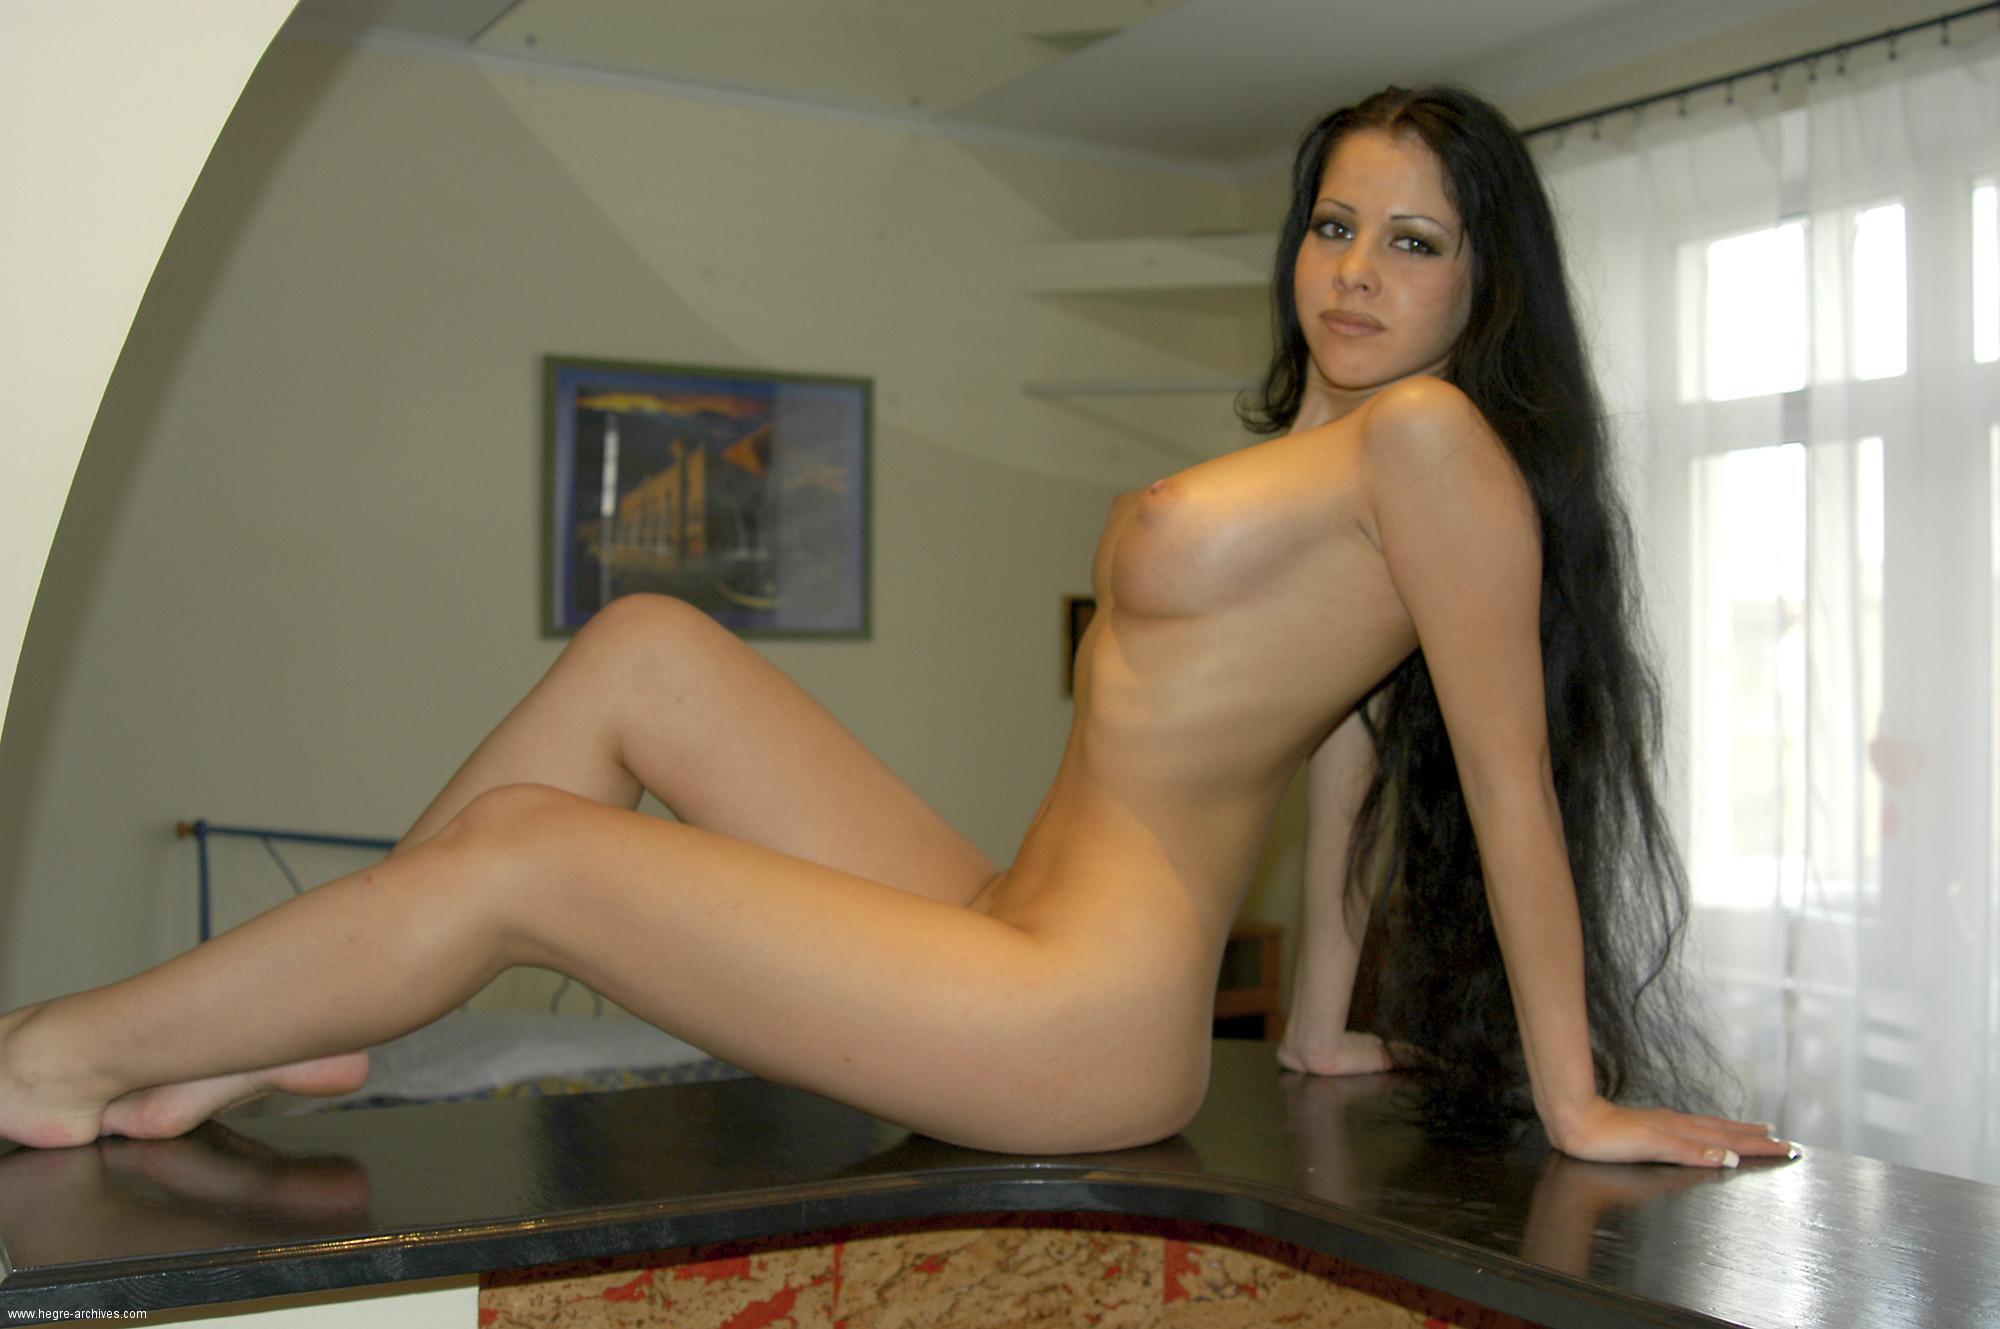 Елена беркова в контакте голая